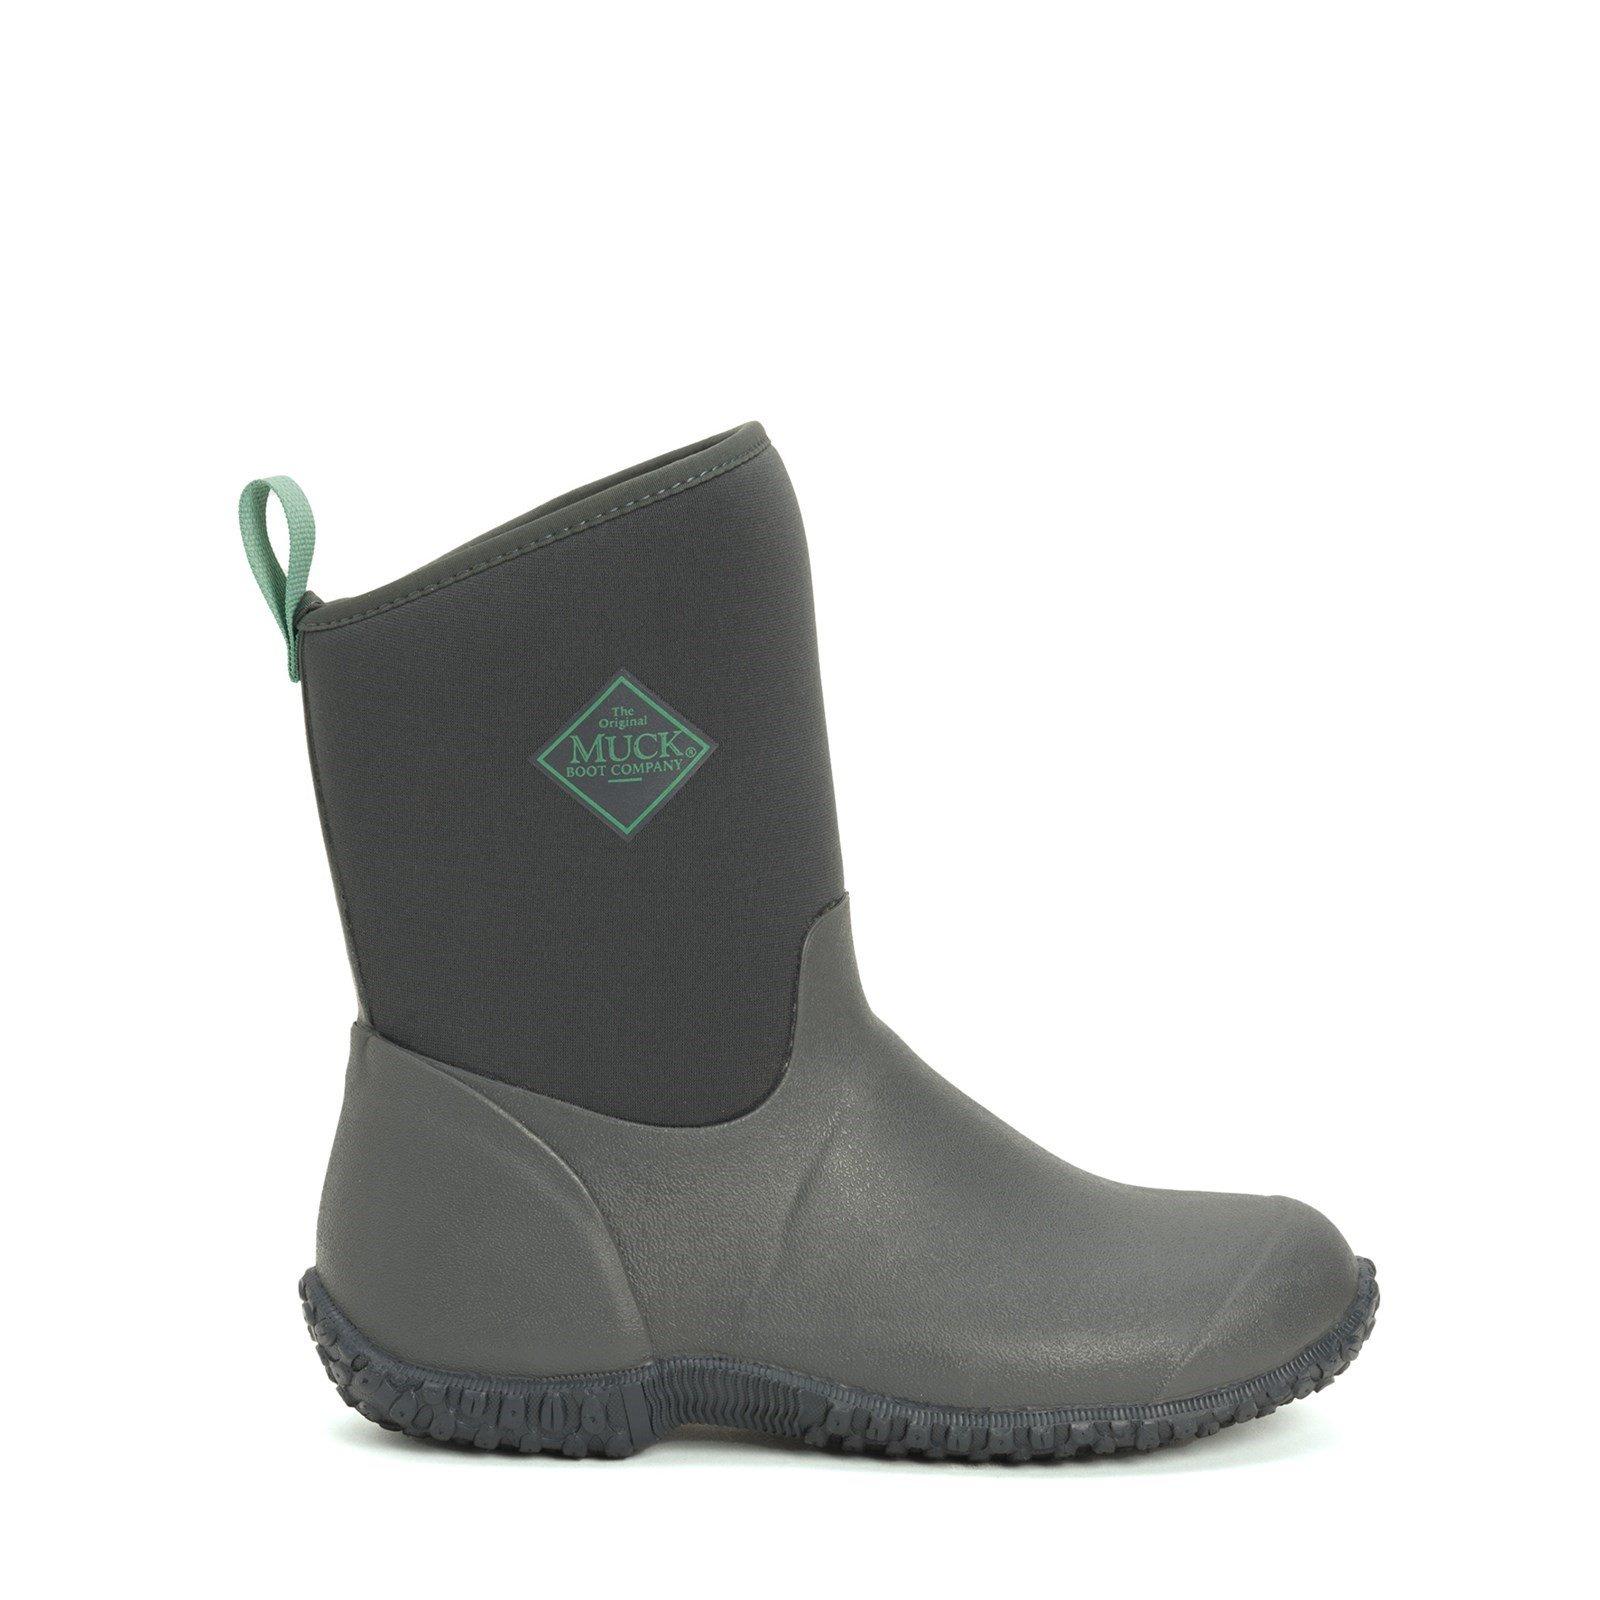 Muck Boots Women's Muckster II Slip On Short Boot Multicolor 28899 - Grey/Print 9